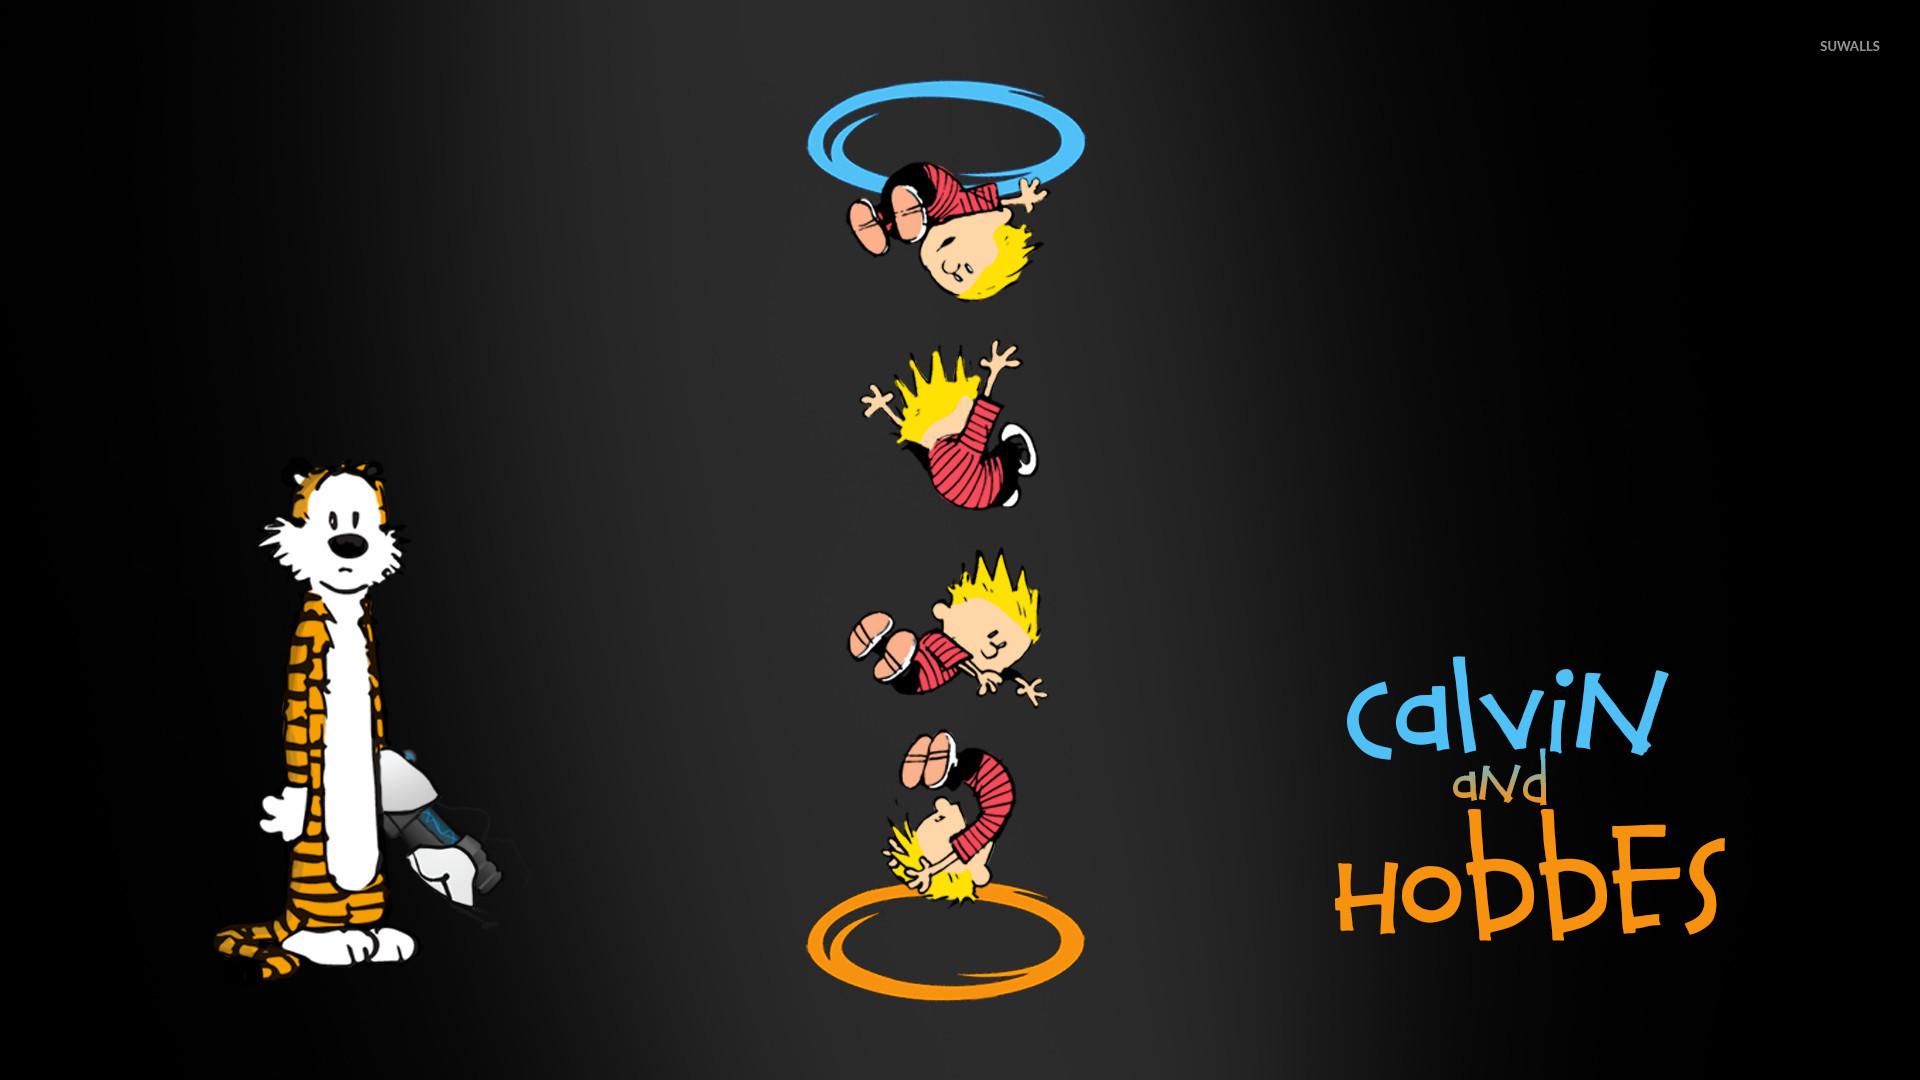 Portal Hobbes Portals Calvin And Hobbes Portal Hobbes Ohhh Portal 1920x1080